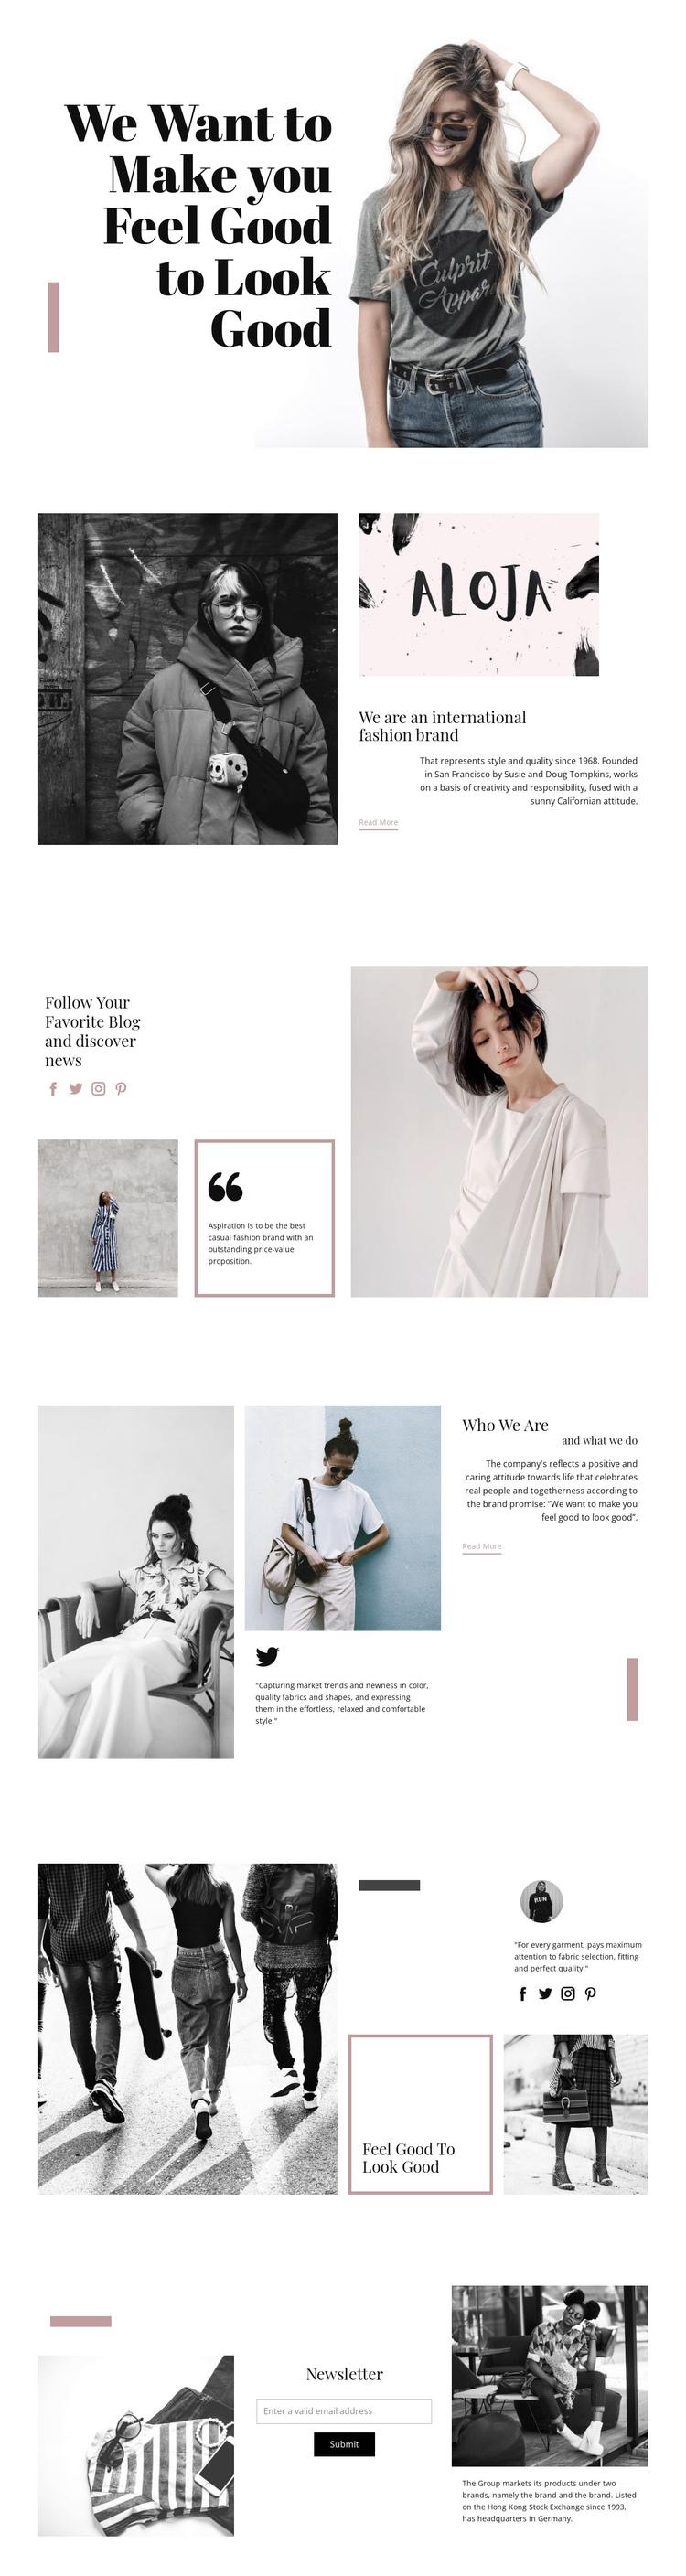 Fashion Style Website Builder Software